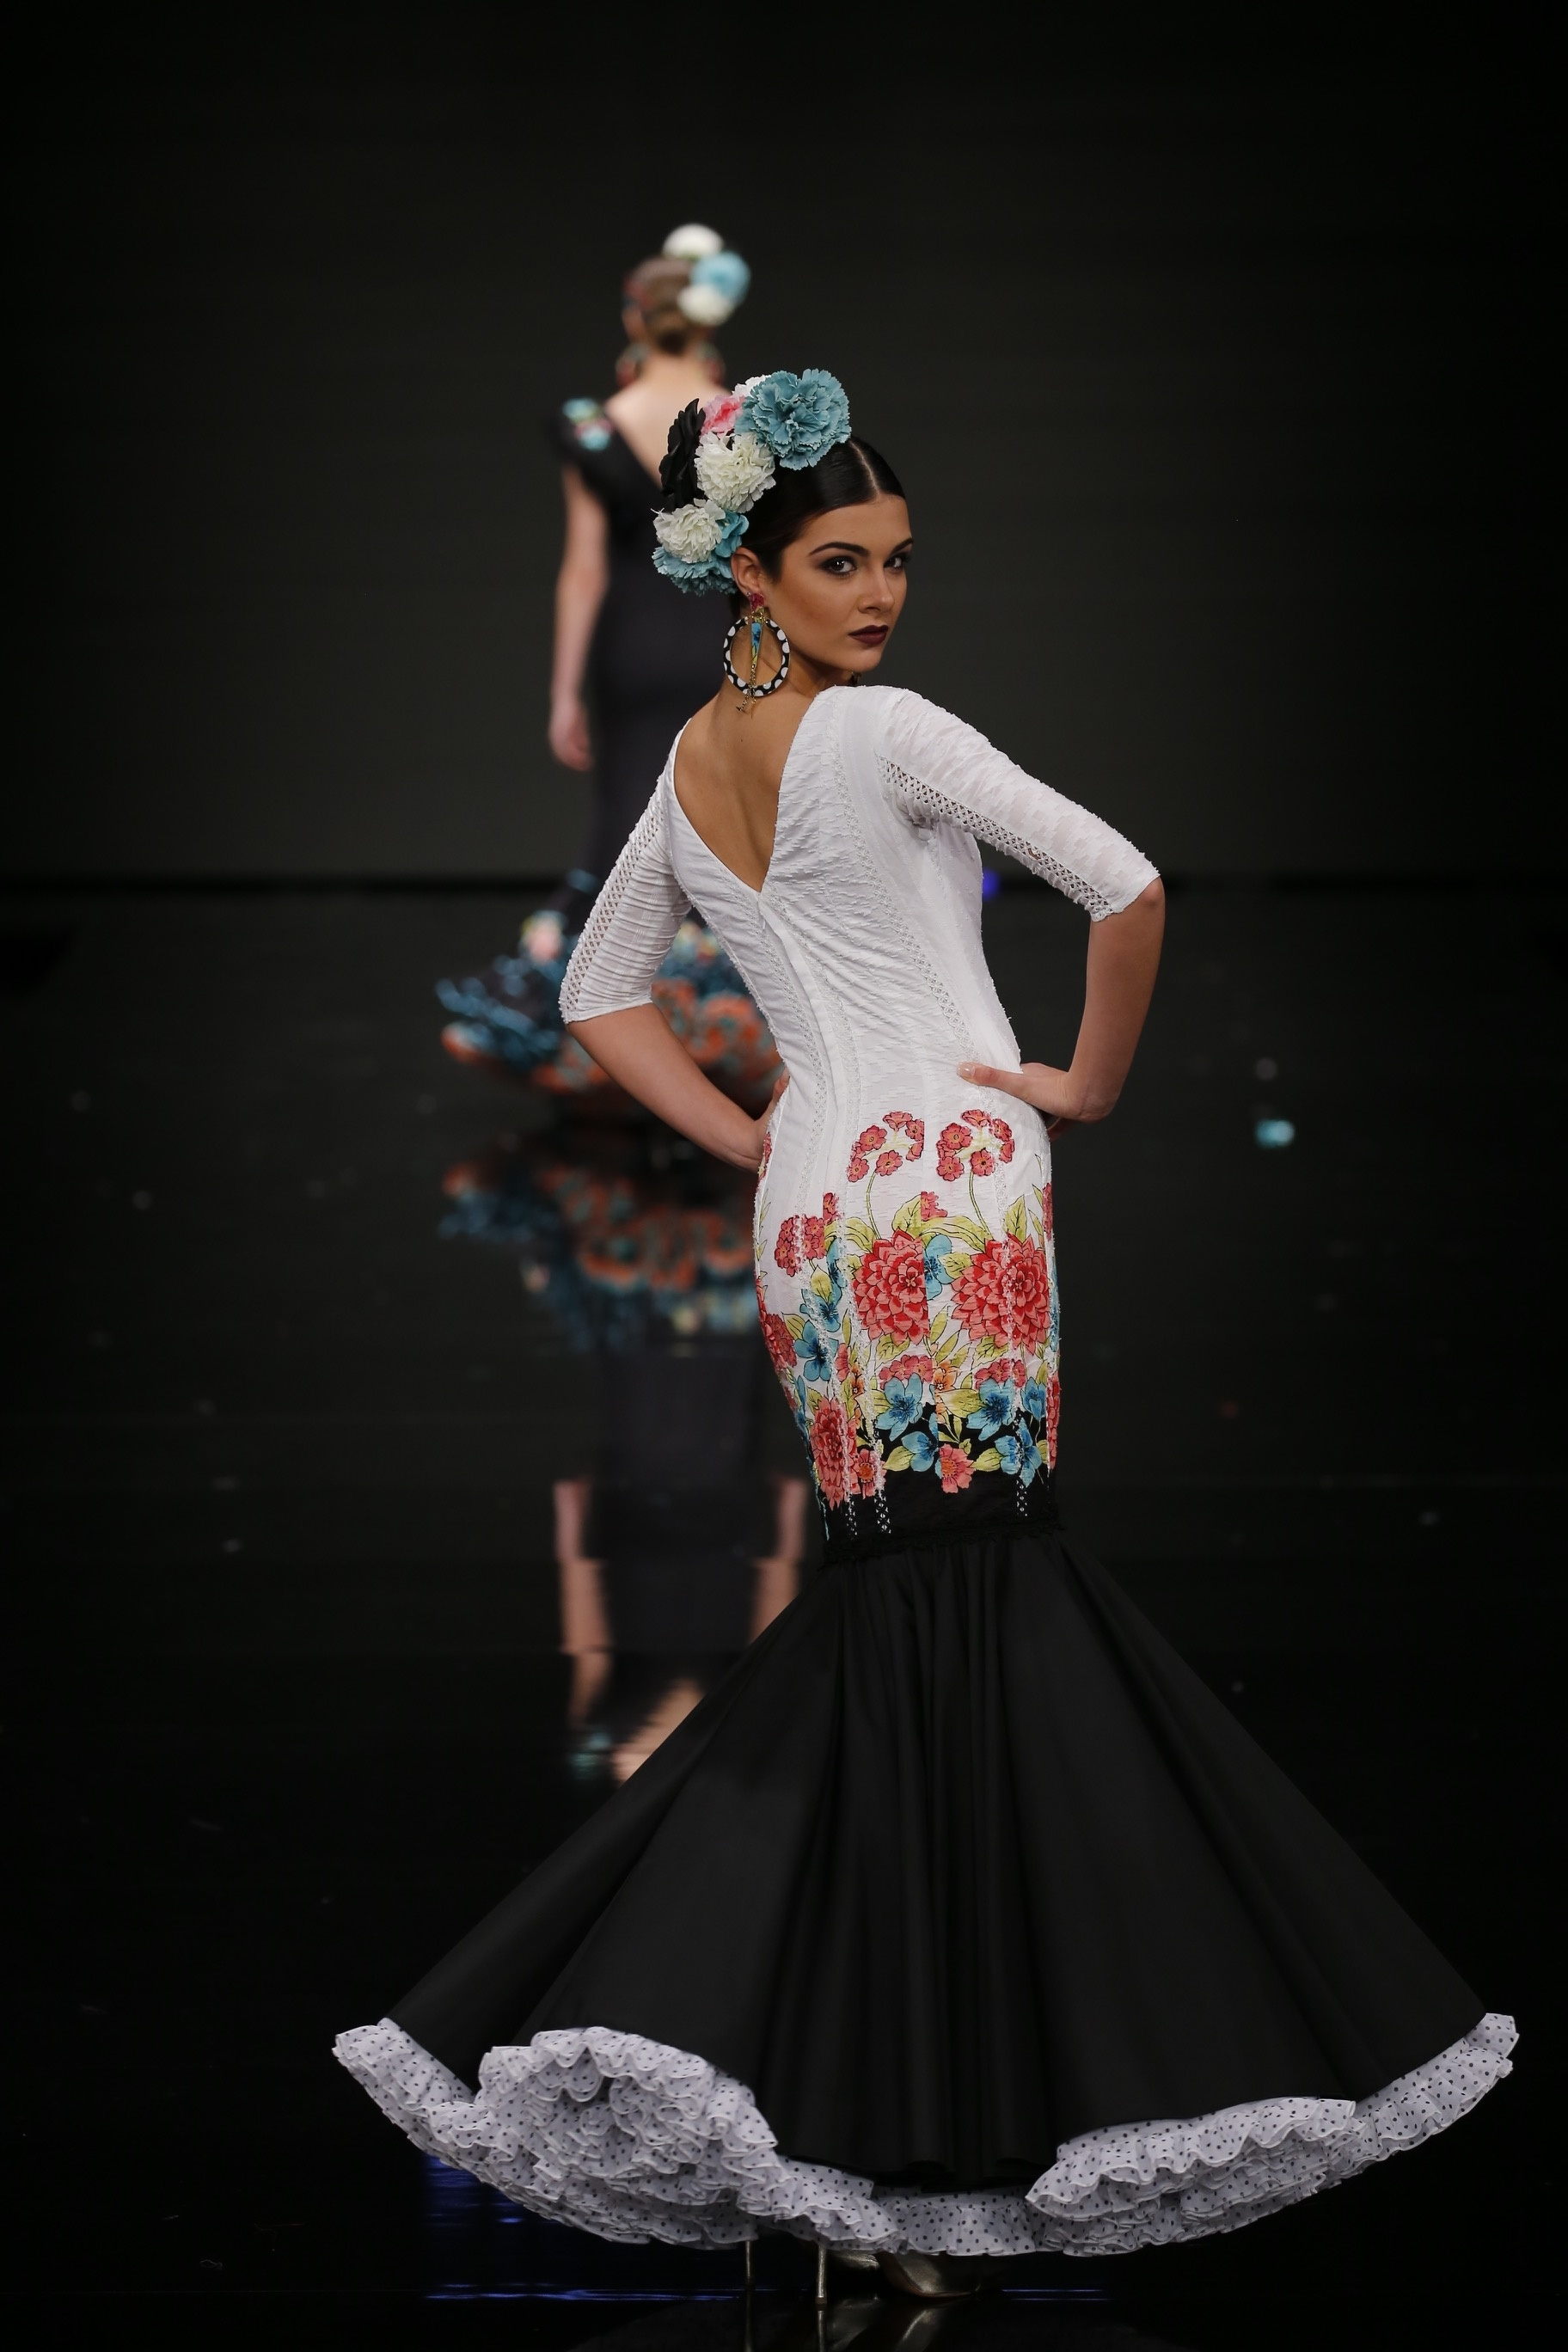 Desfile de moda de apasionada en saloacuten eroacutetico paixxon galega 2015 - 4 3